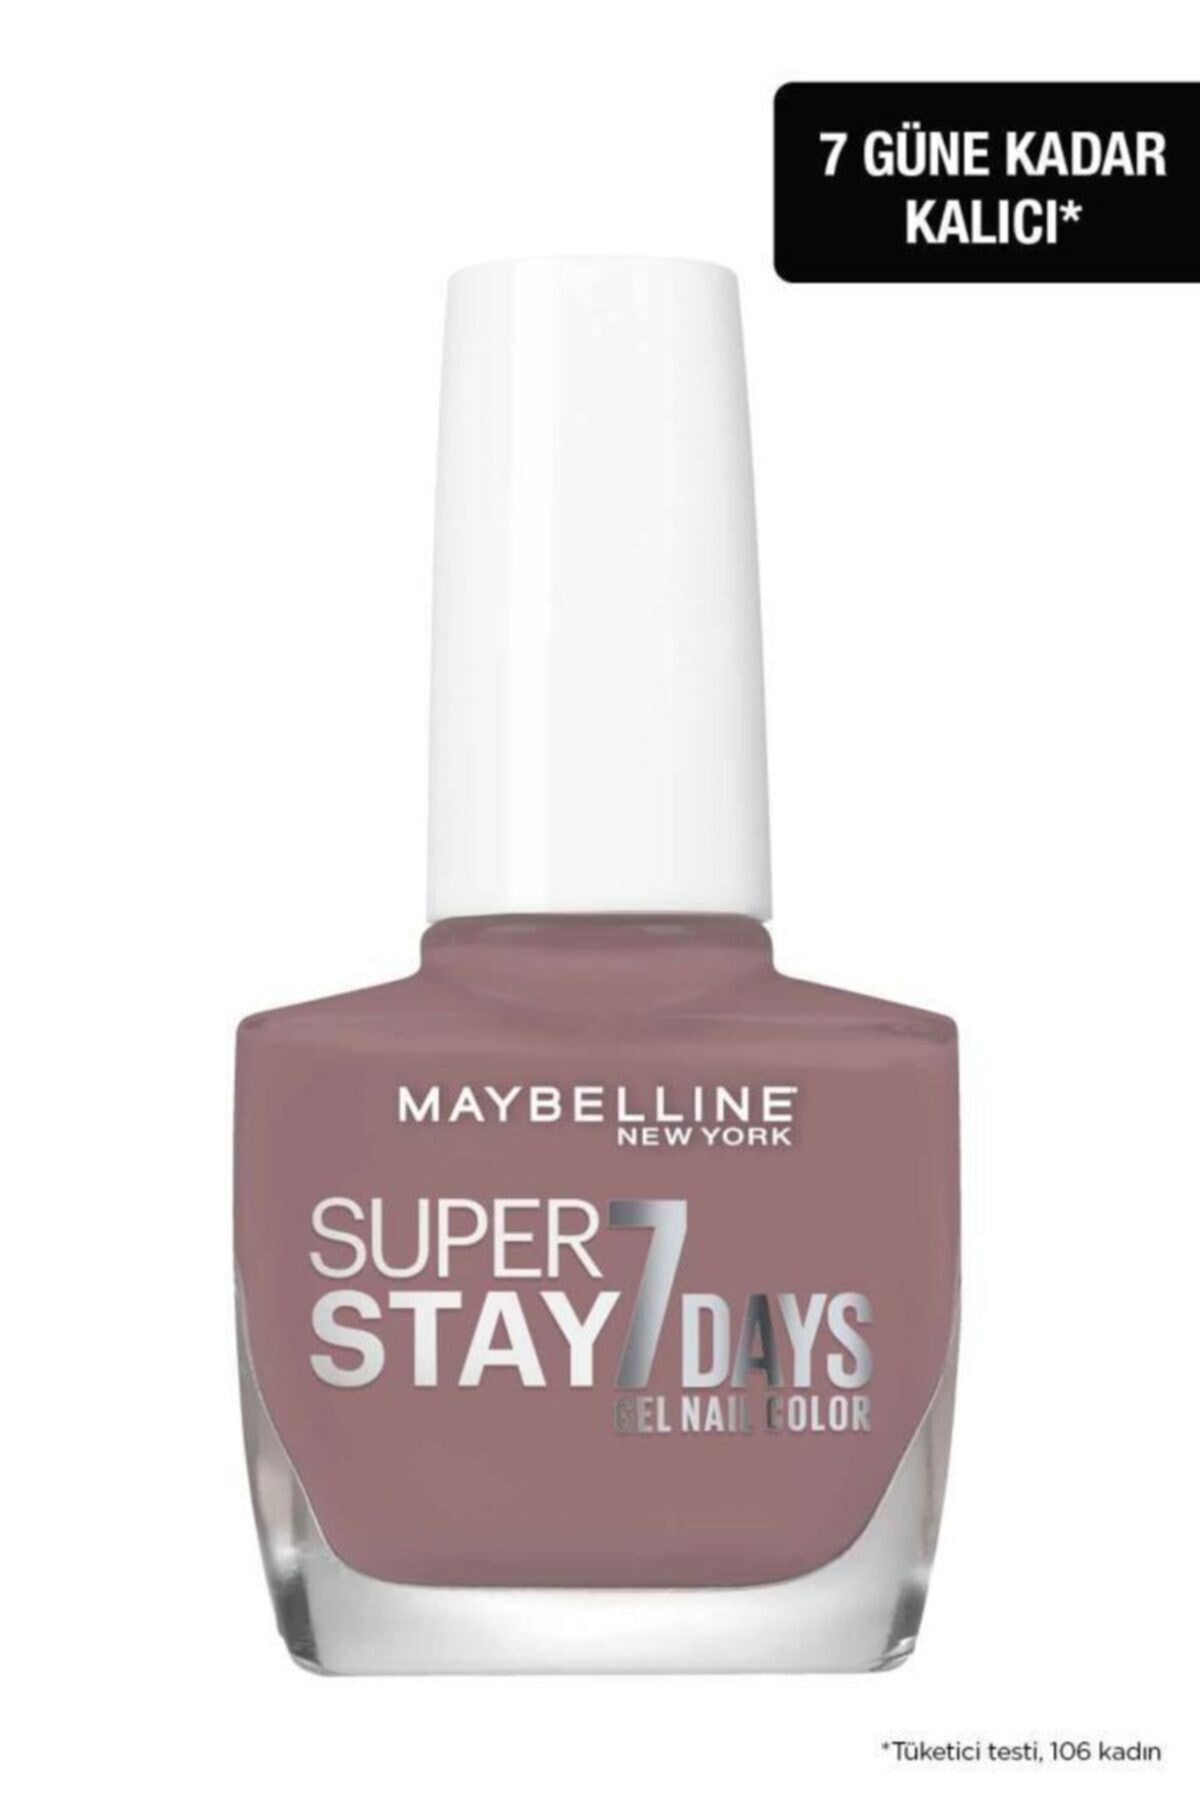 Maybelline New York Super Stay Oje- 911 Stre 2